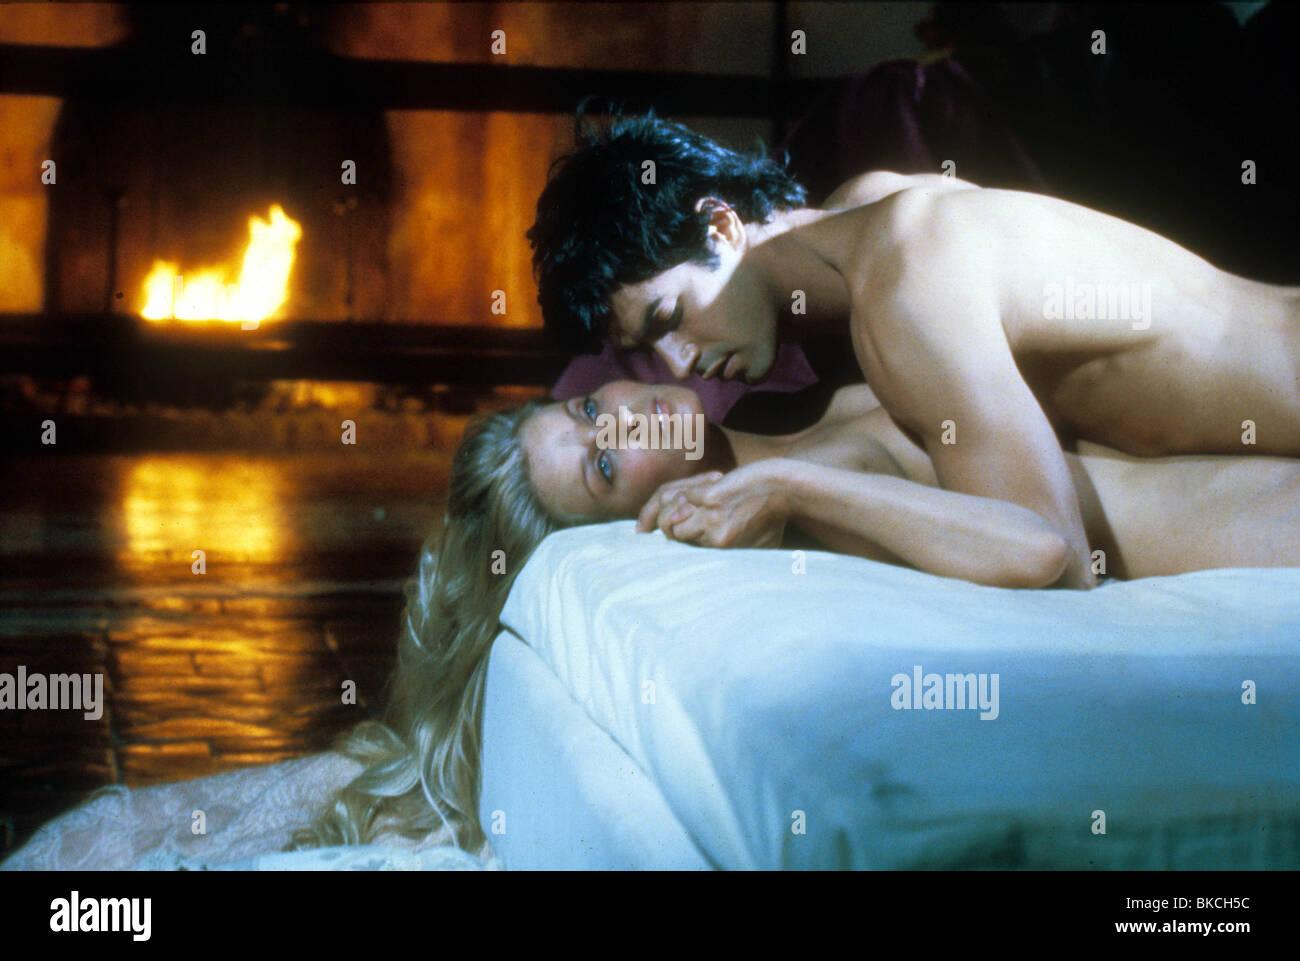 BOLERO (1984) BO DEREK, ANDREA OCCHIPINTI BOL 007 Photo Stock